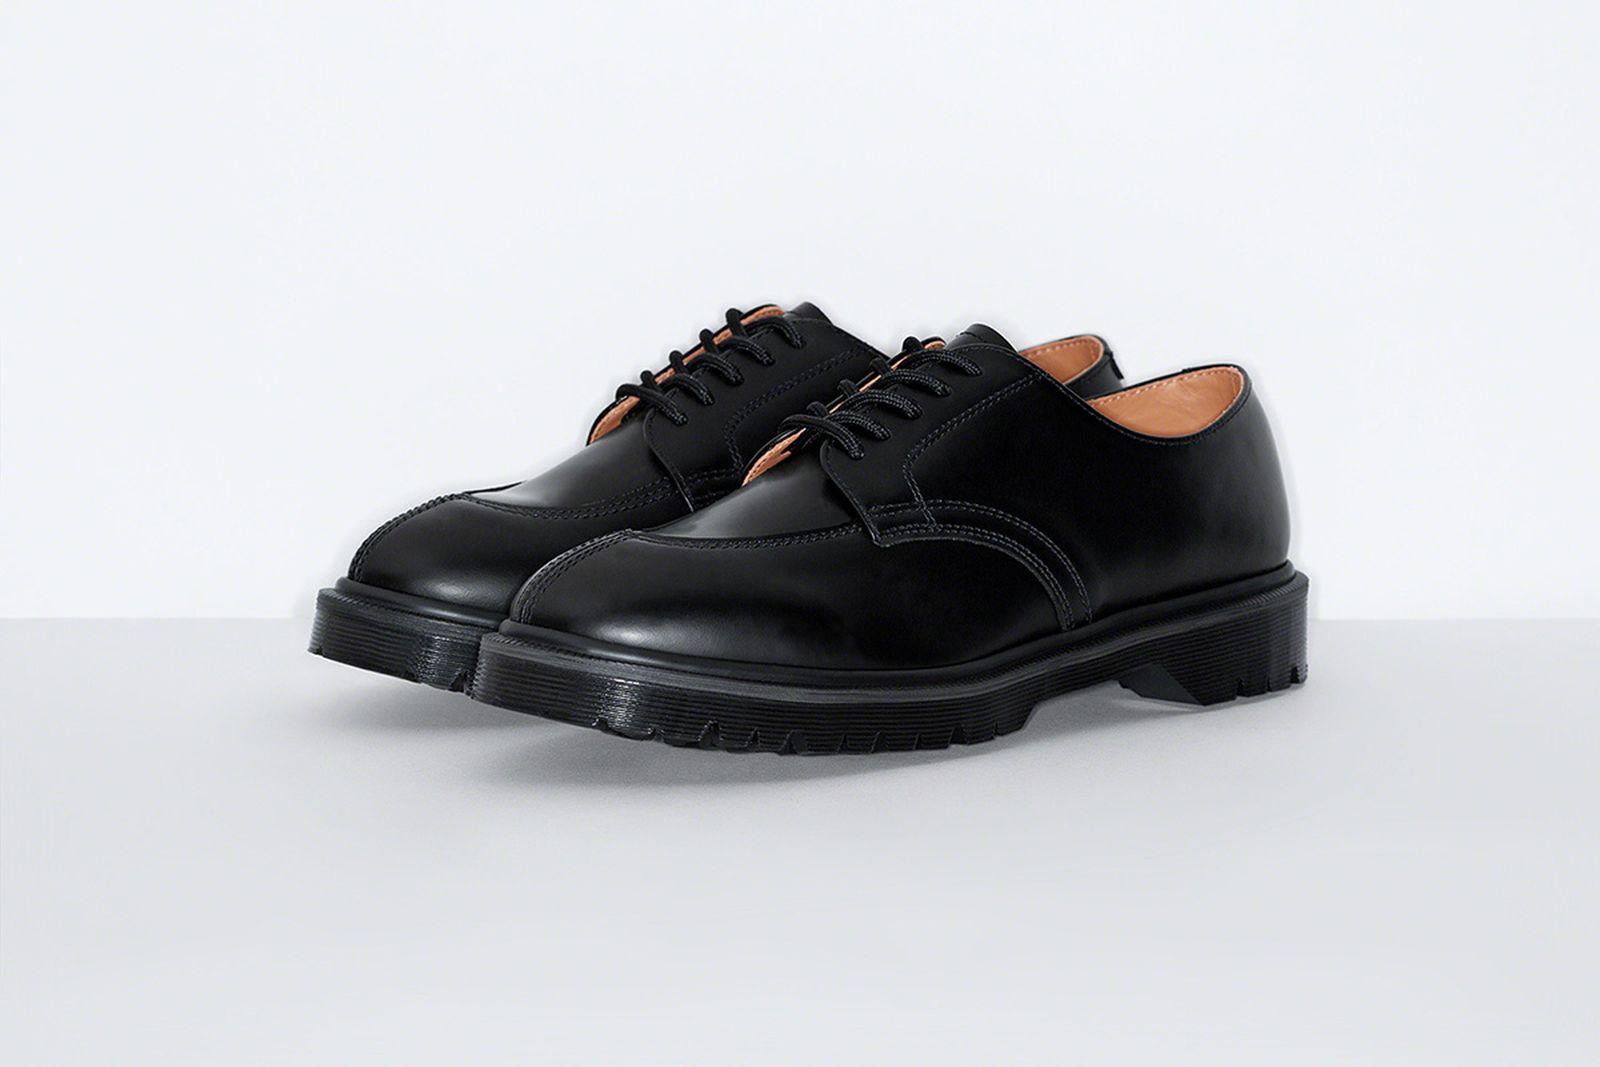 supreme-dr-martens-5-eye-shoe-release-date-price-09